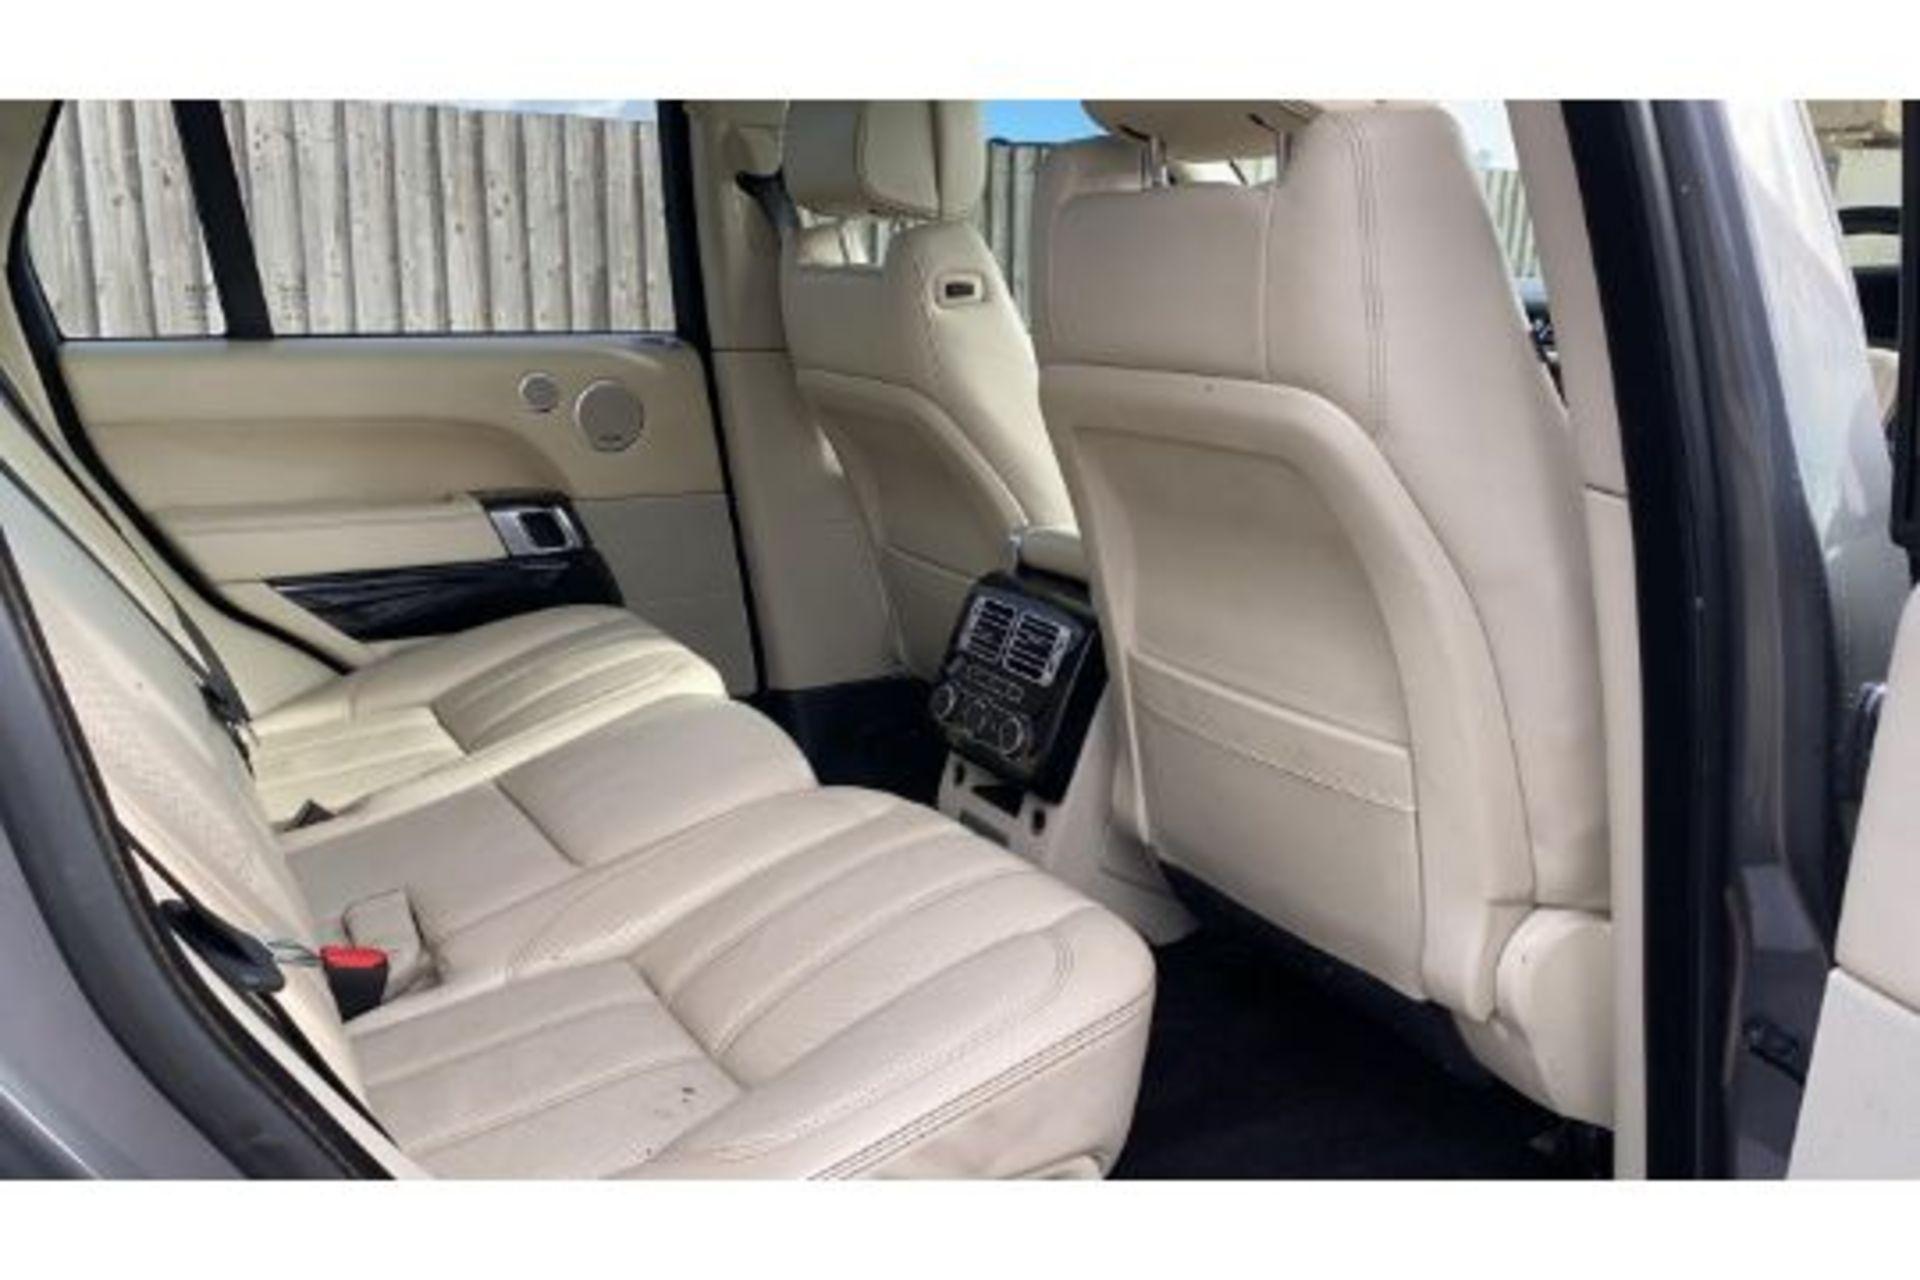 Range Rover Vogue 3.0 TDV6 SE Auto - Black Pack - NEW SHAPE - FULLY LOADED - Pan Roof - Image 17 of 30